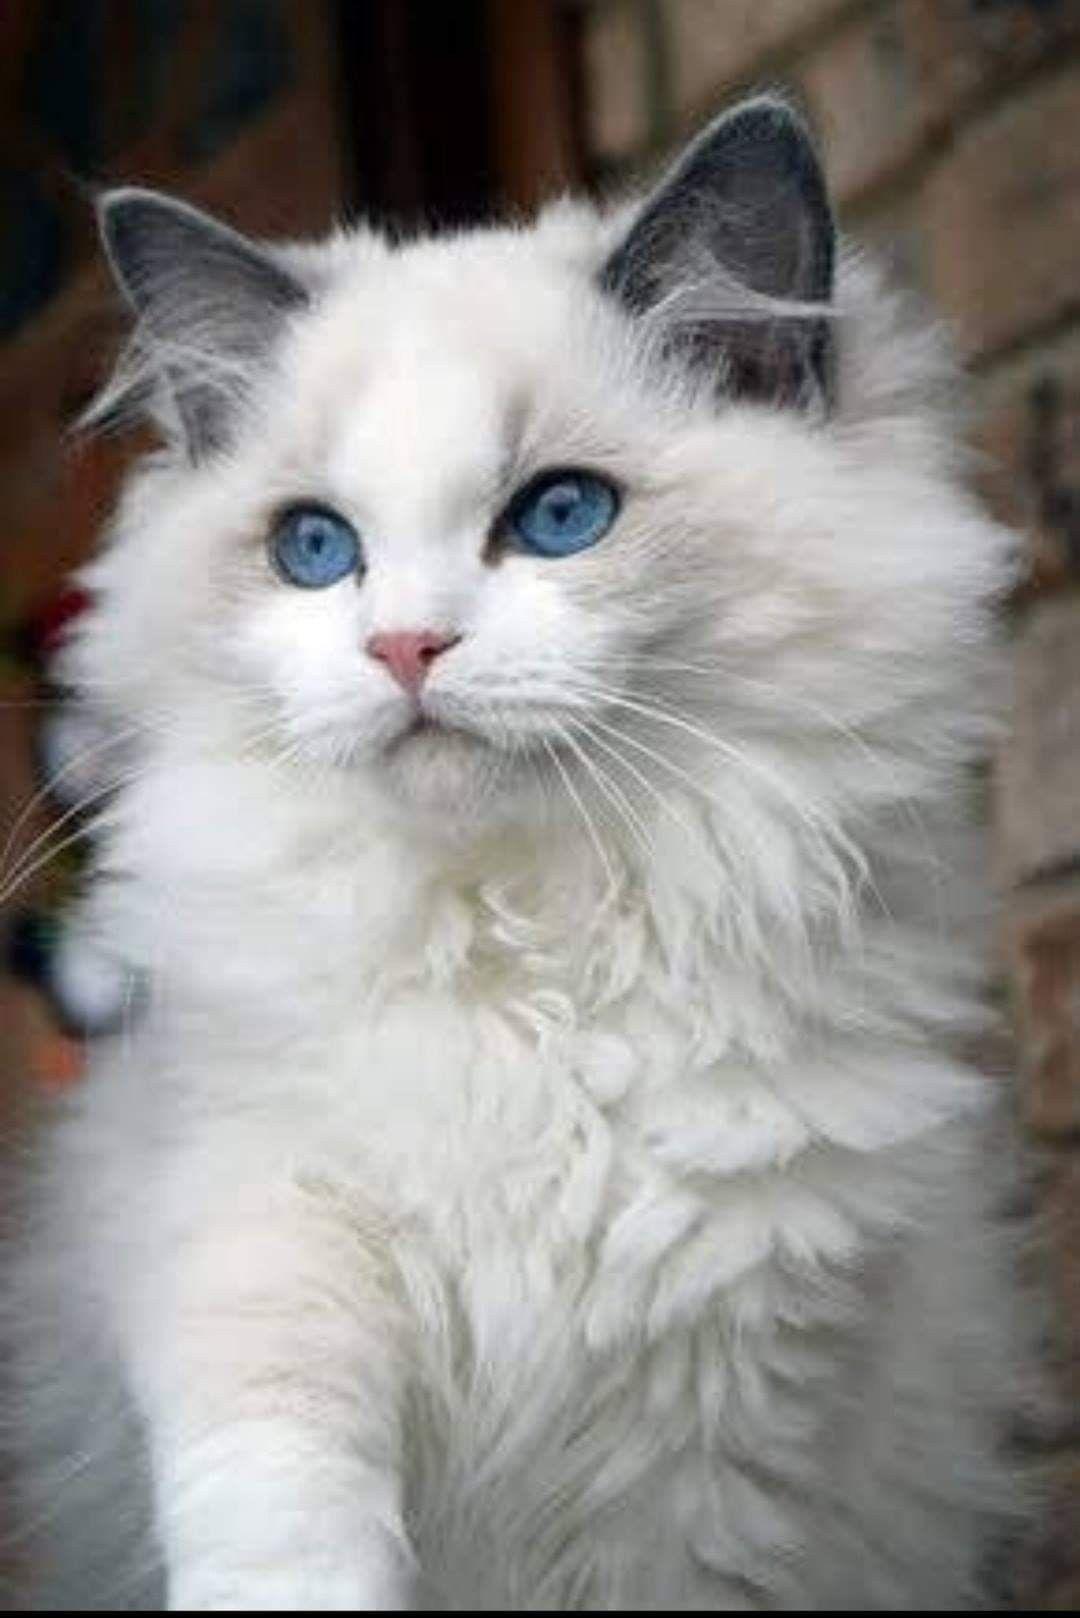 Pin By Victoria Tripplett On Precious Animals Pretty Cats